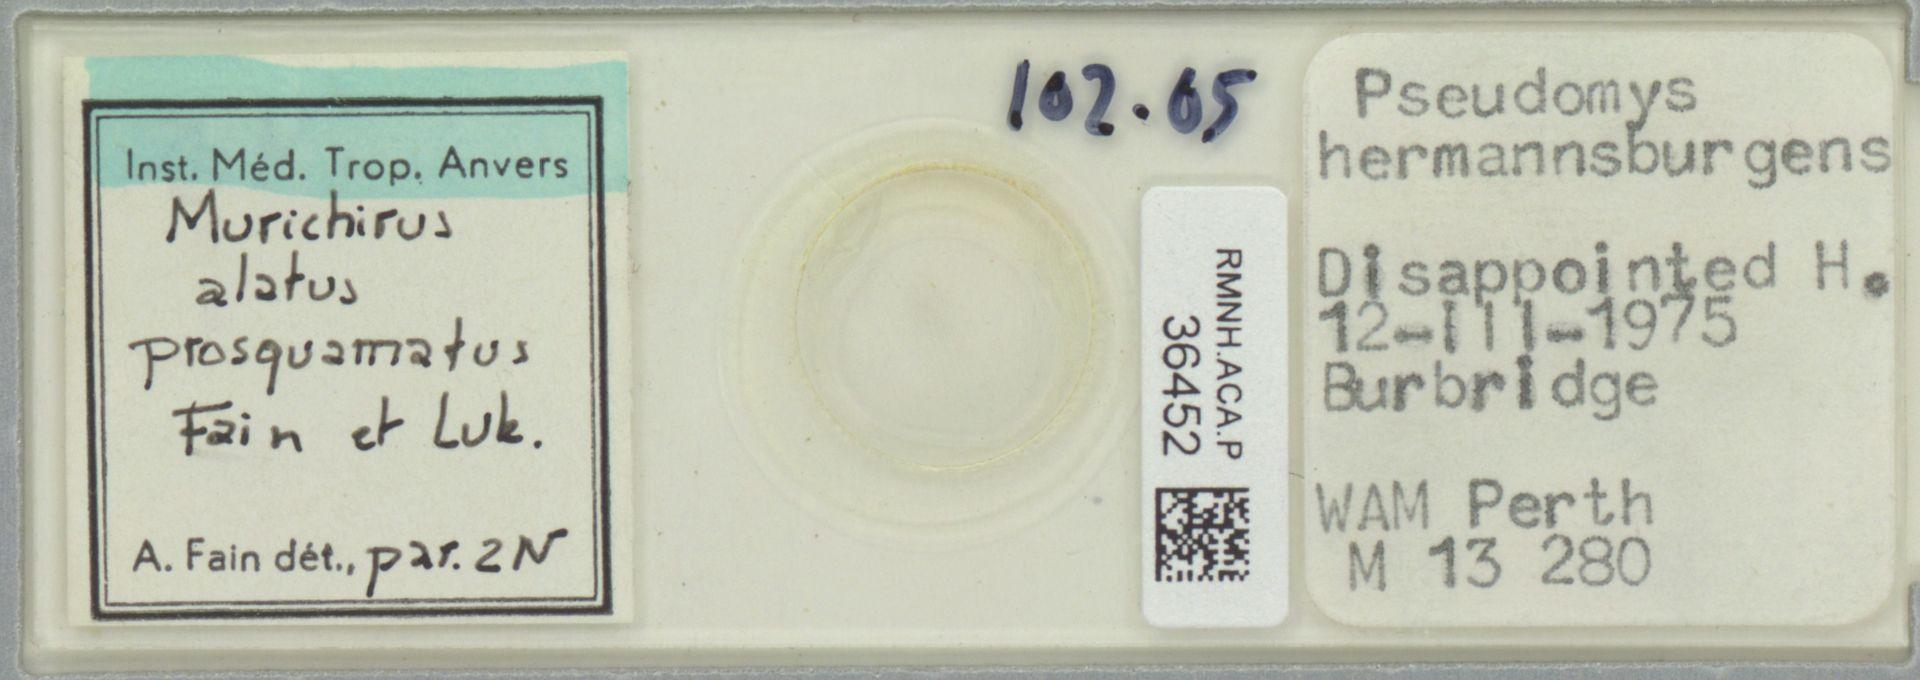 RMNH.ACA.P.36452   Murichirus alatus prosquamatus Fain & Luk.